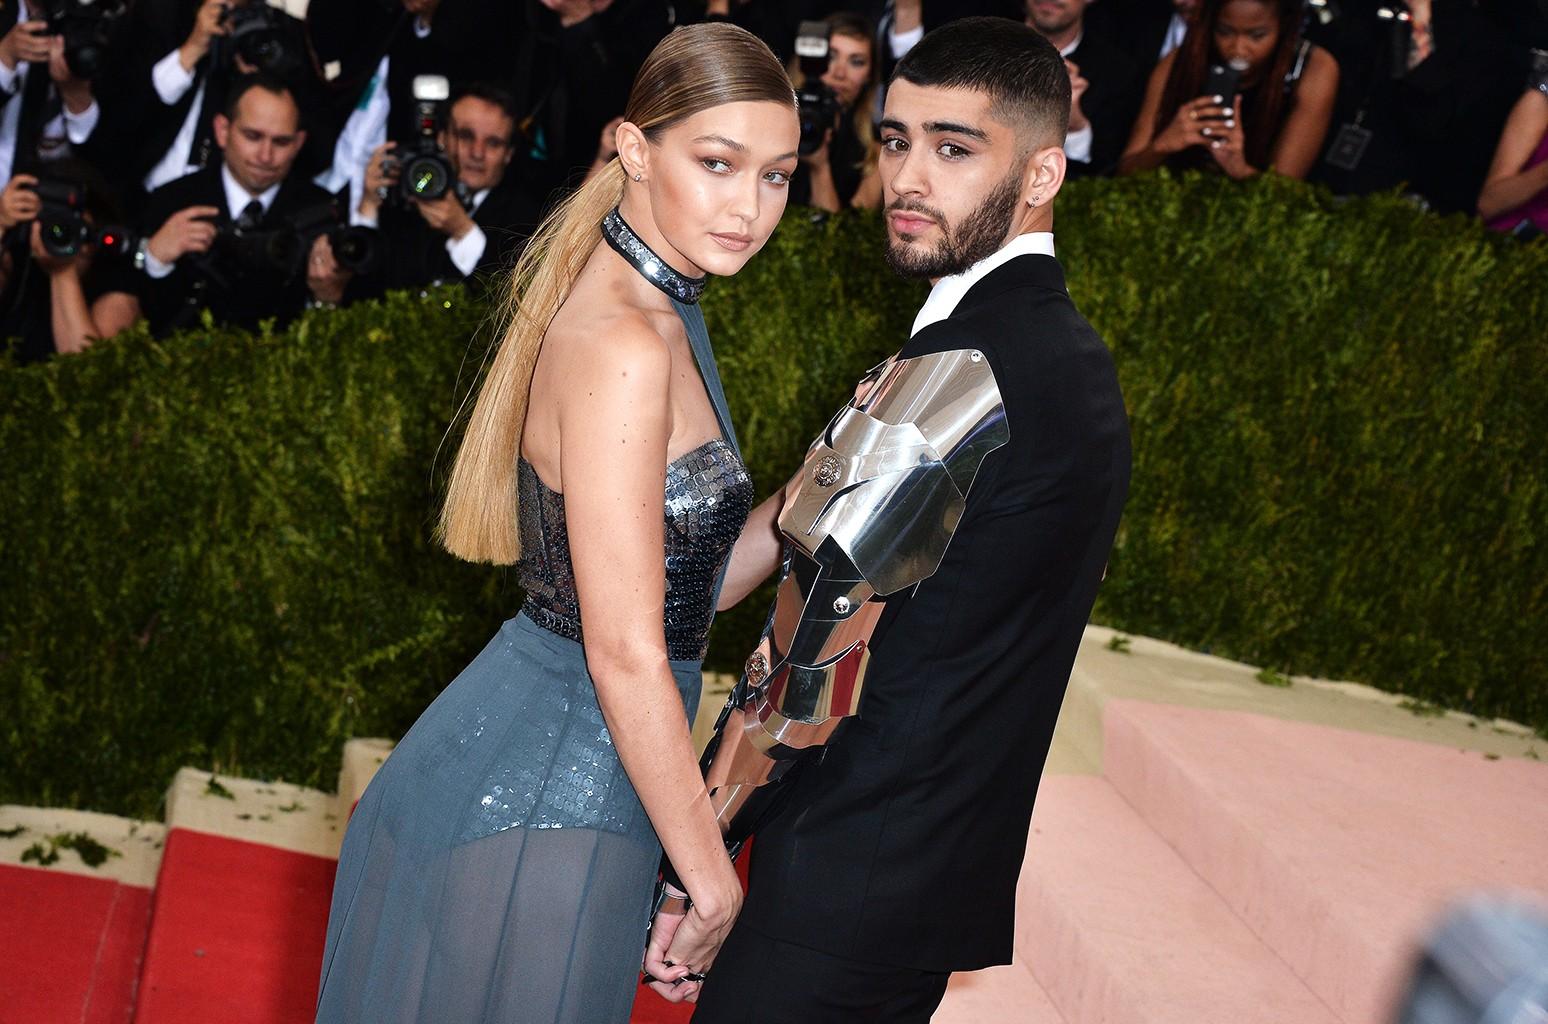 Zayn Malik and Gigi Hadid attend the 2016 Met Gala